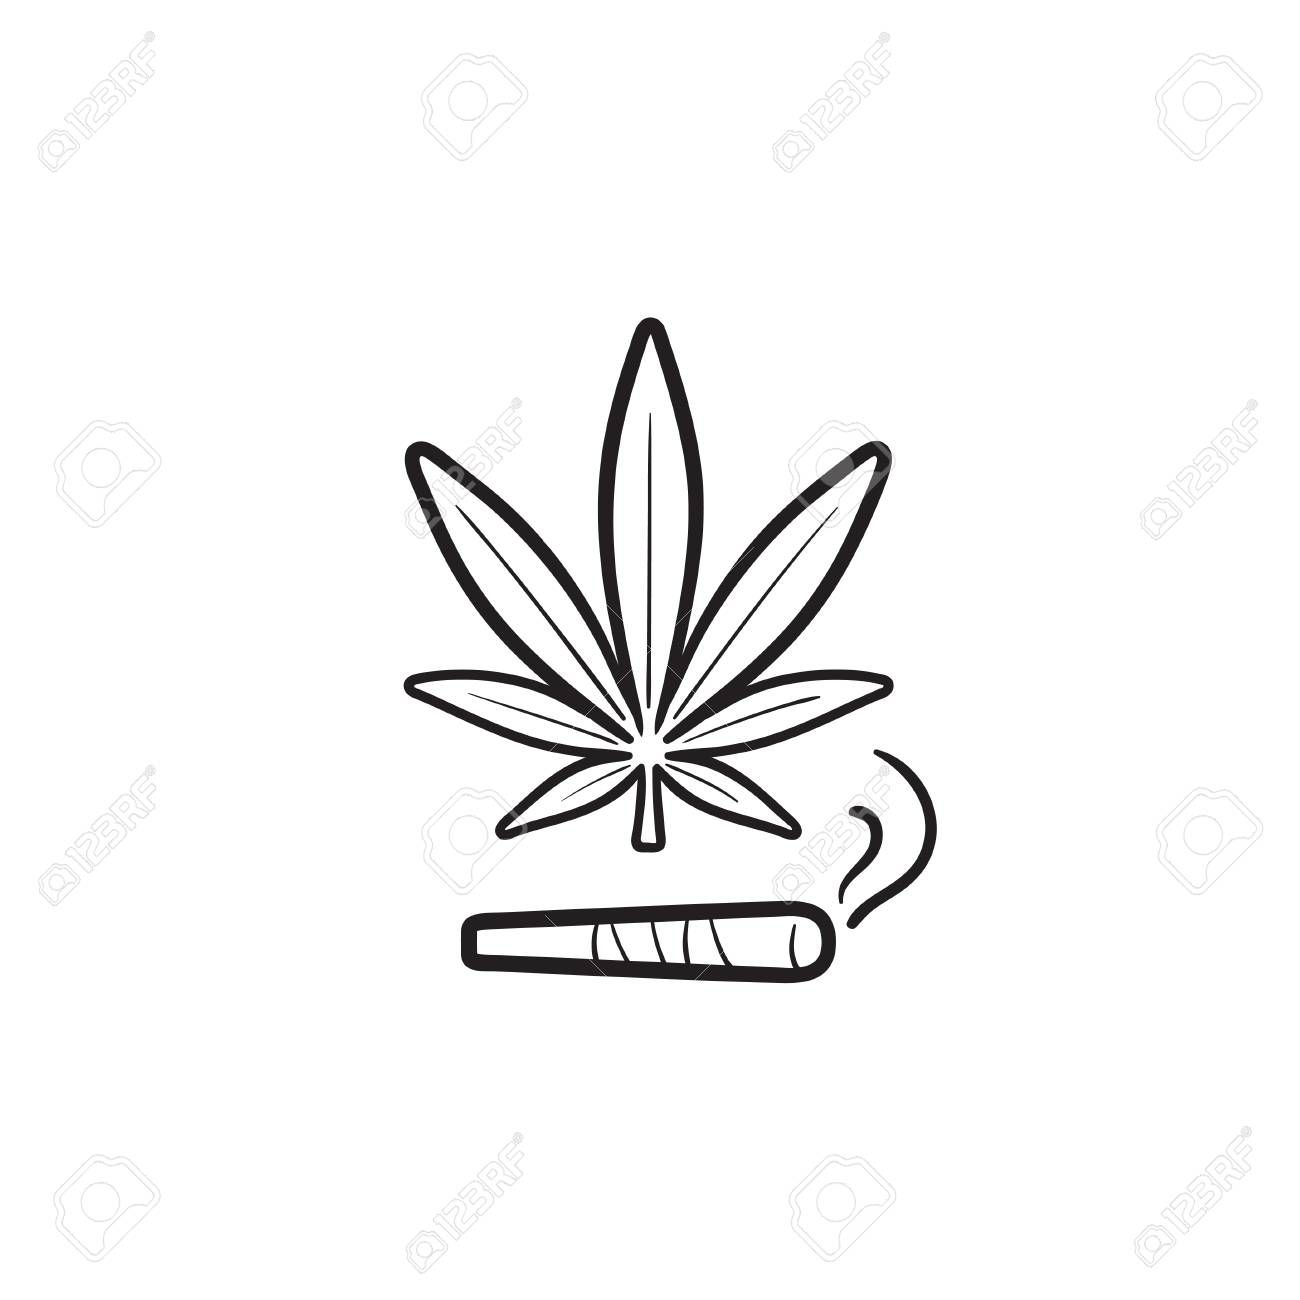 50++ Marijuana leaf clipart black and white information